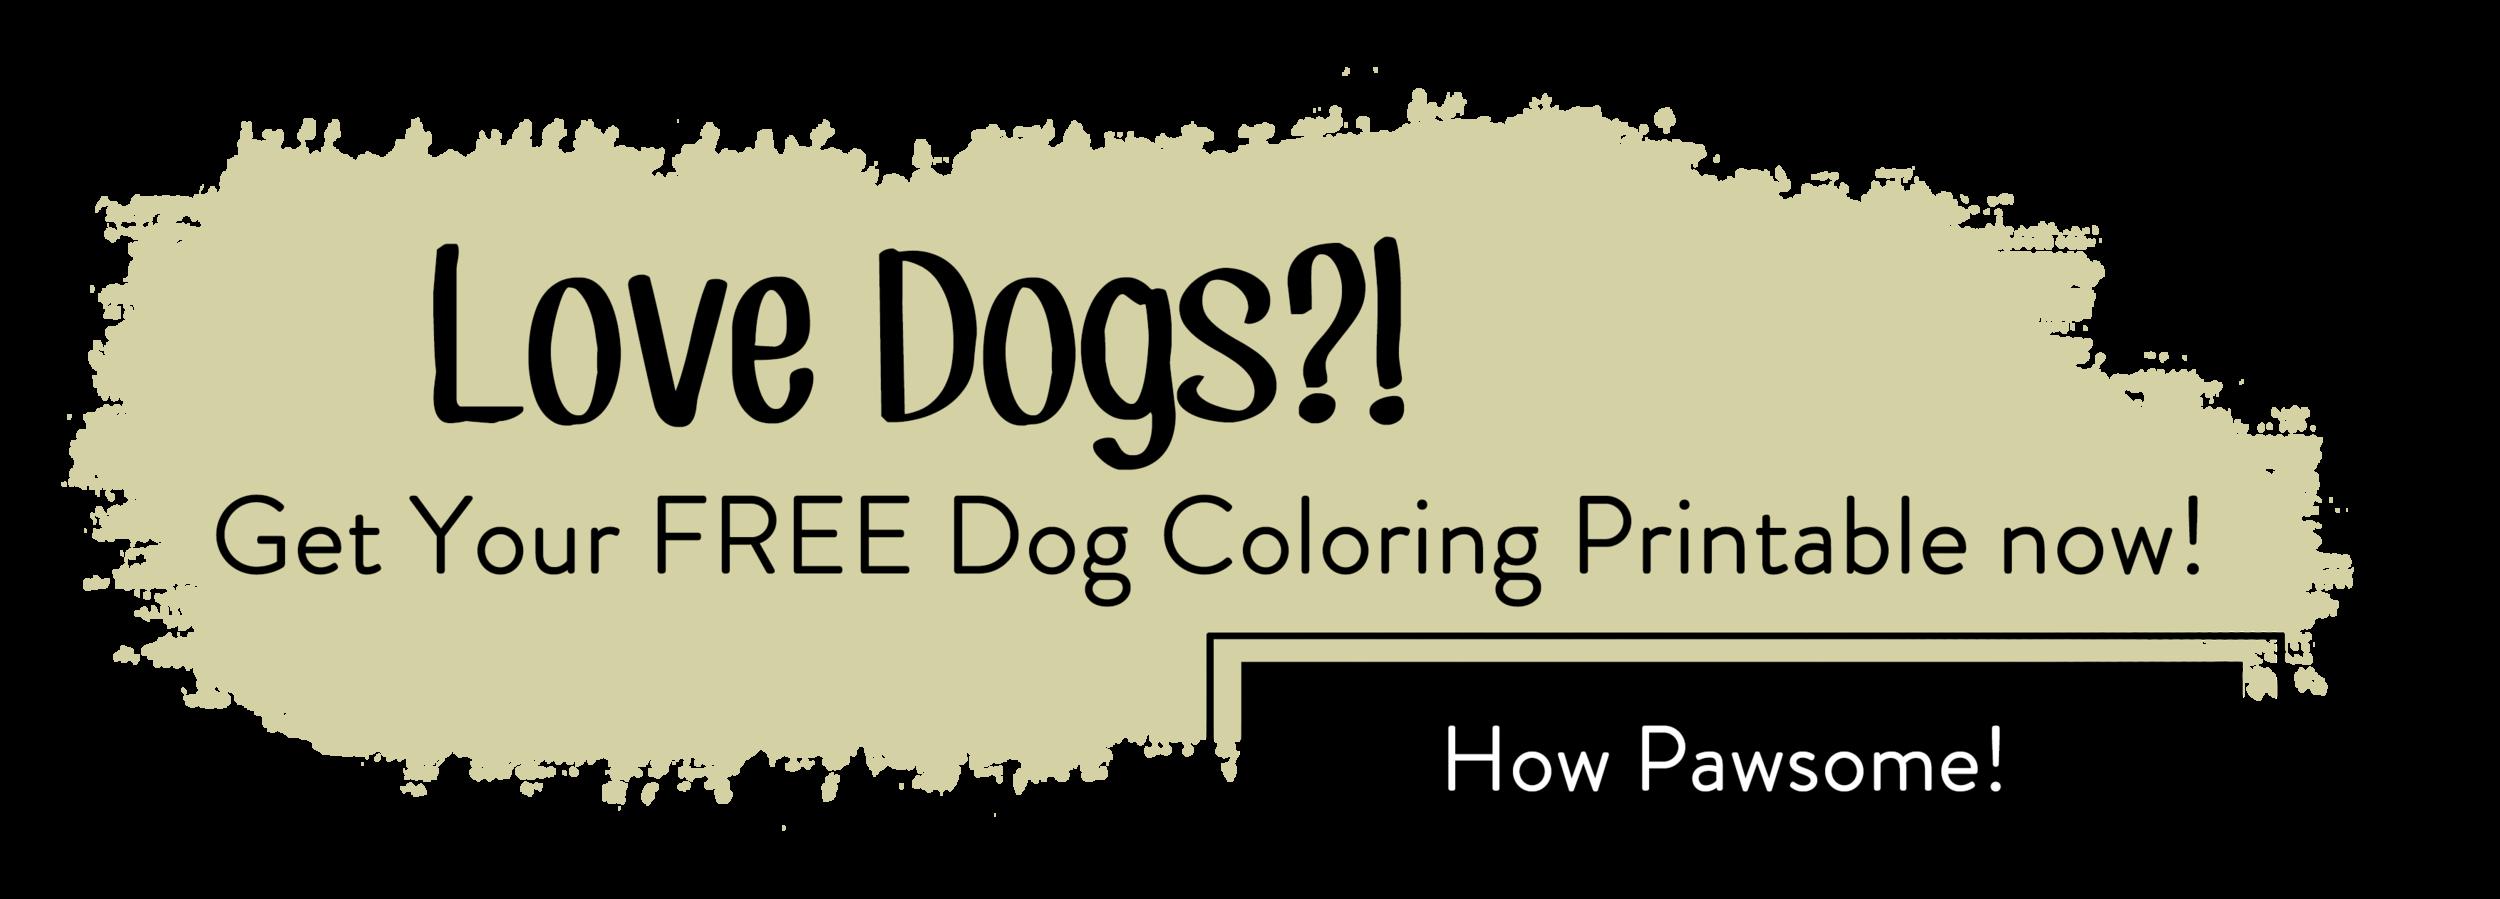 dog coloring page correct.png